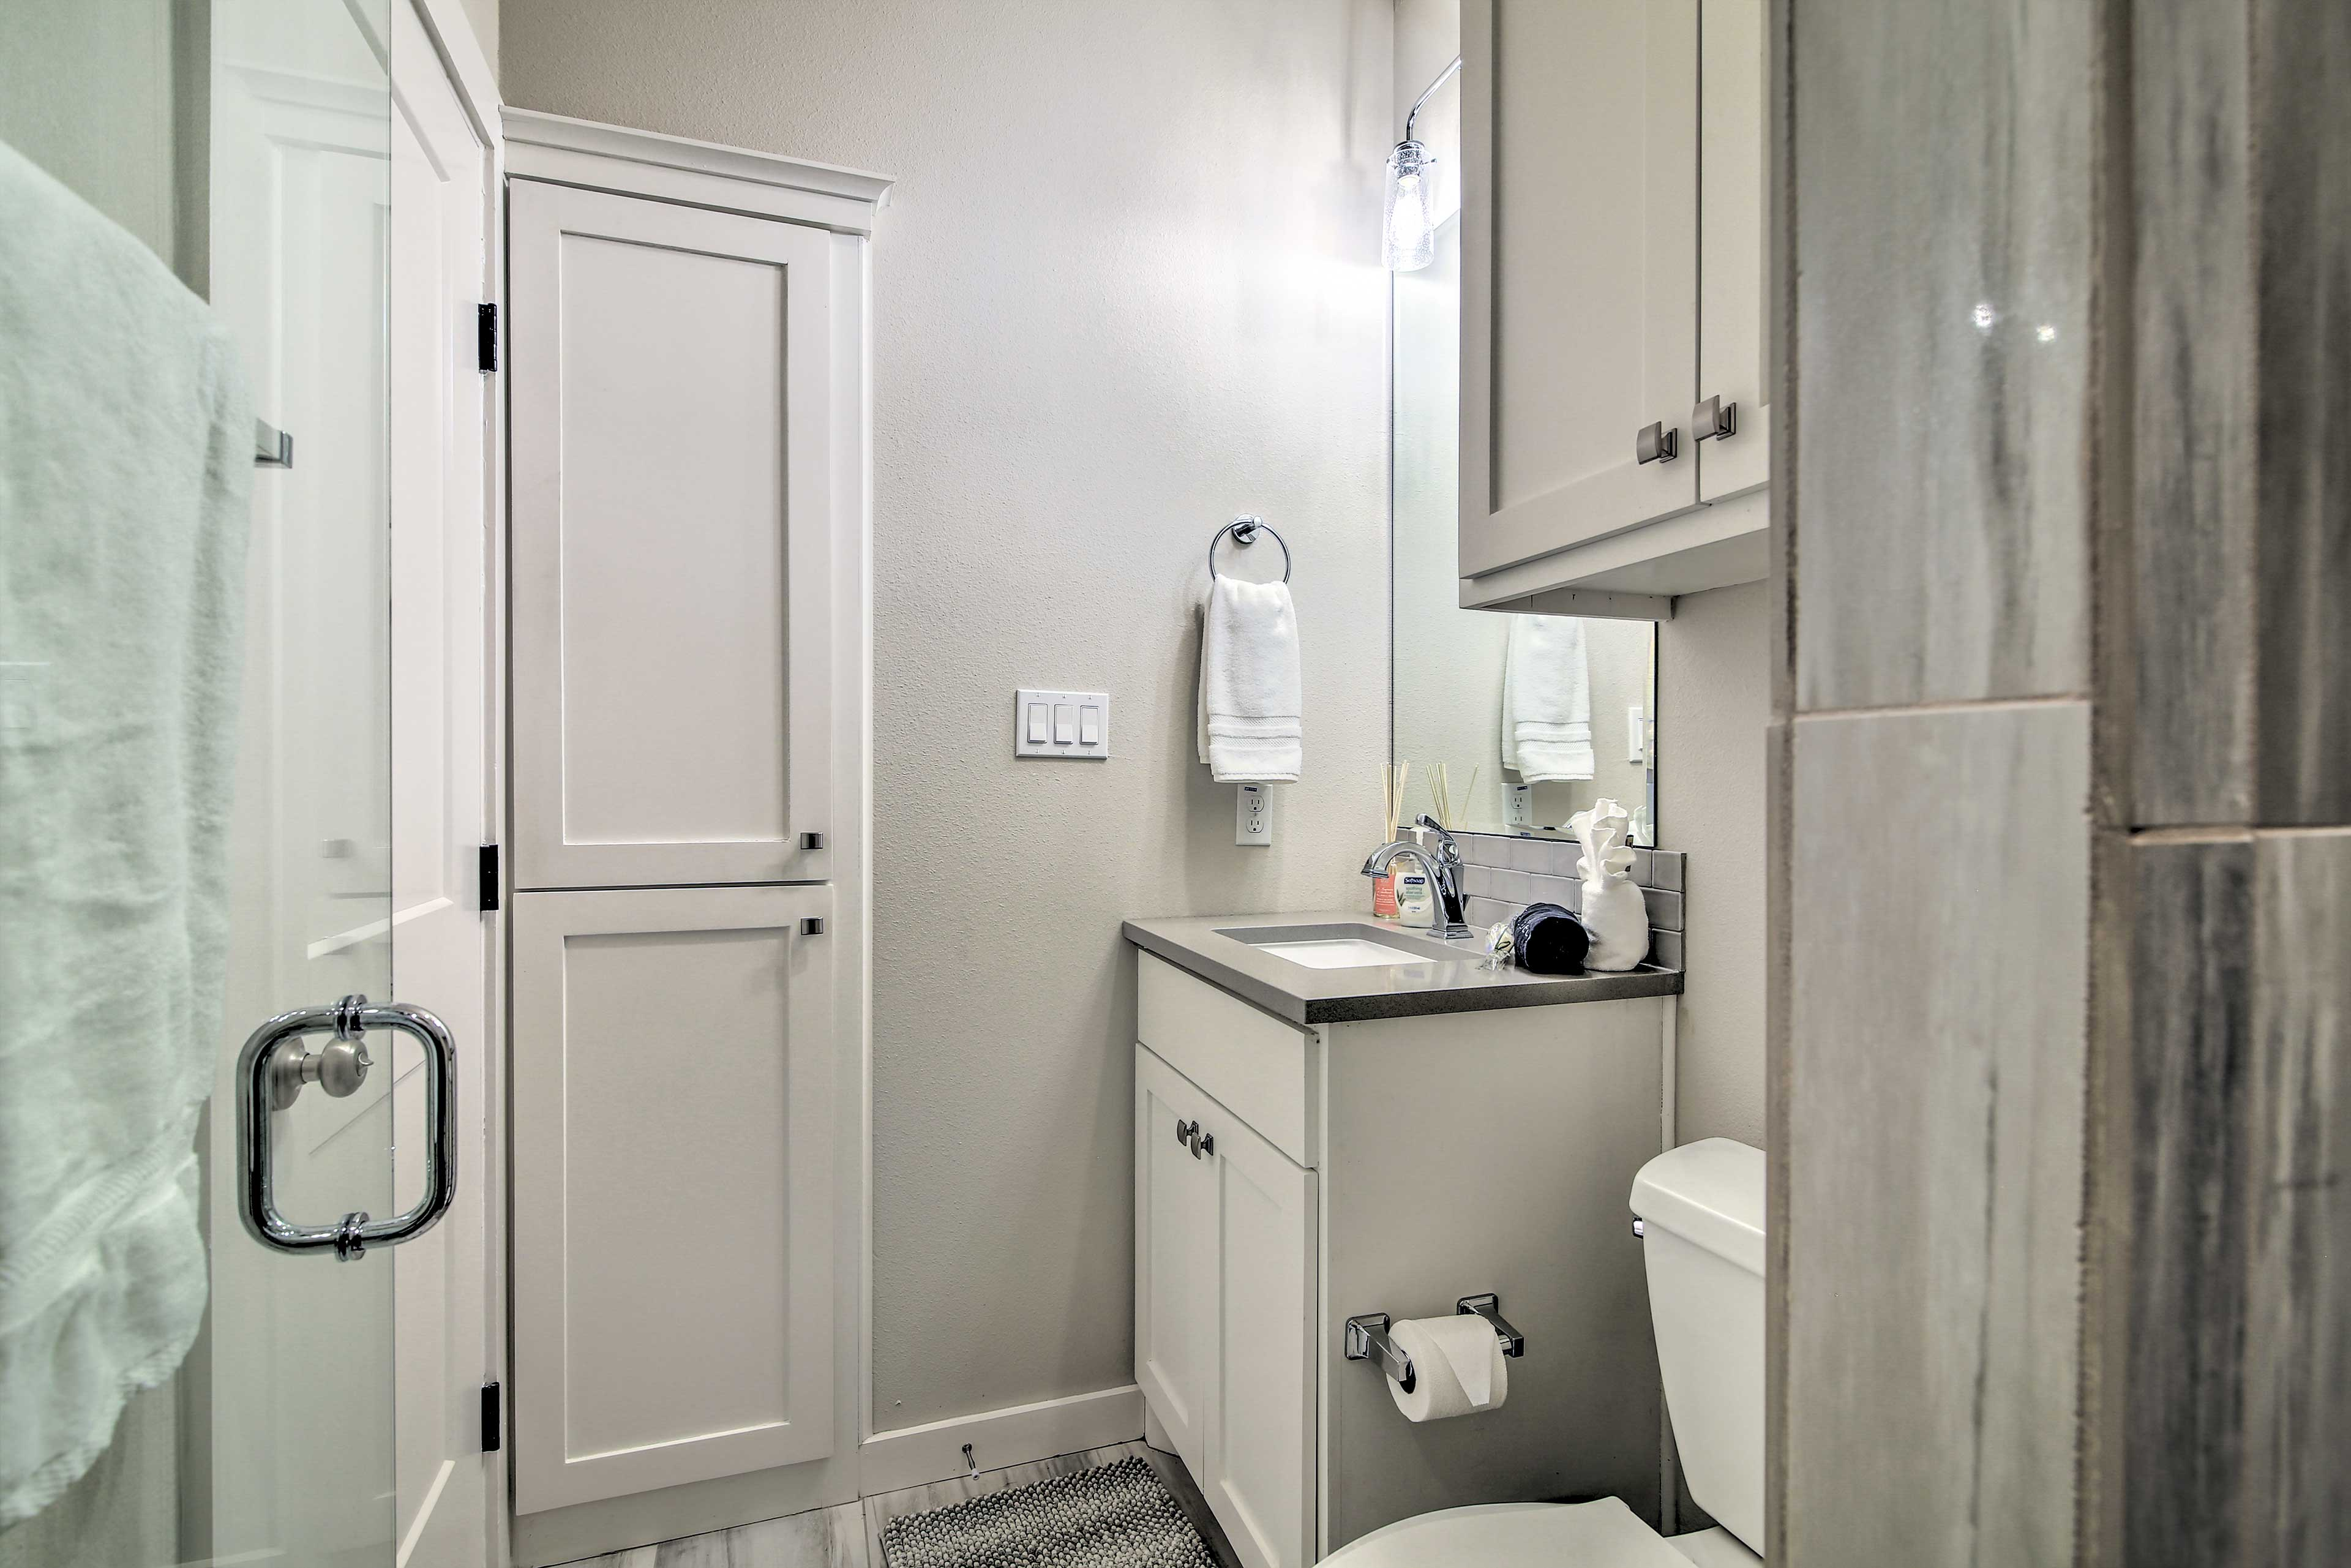 The full bathroom has top-notch furnishings.